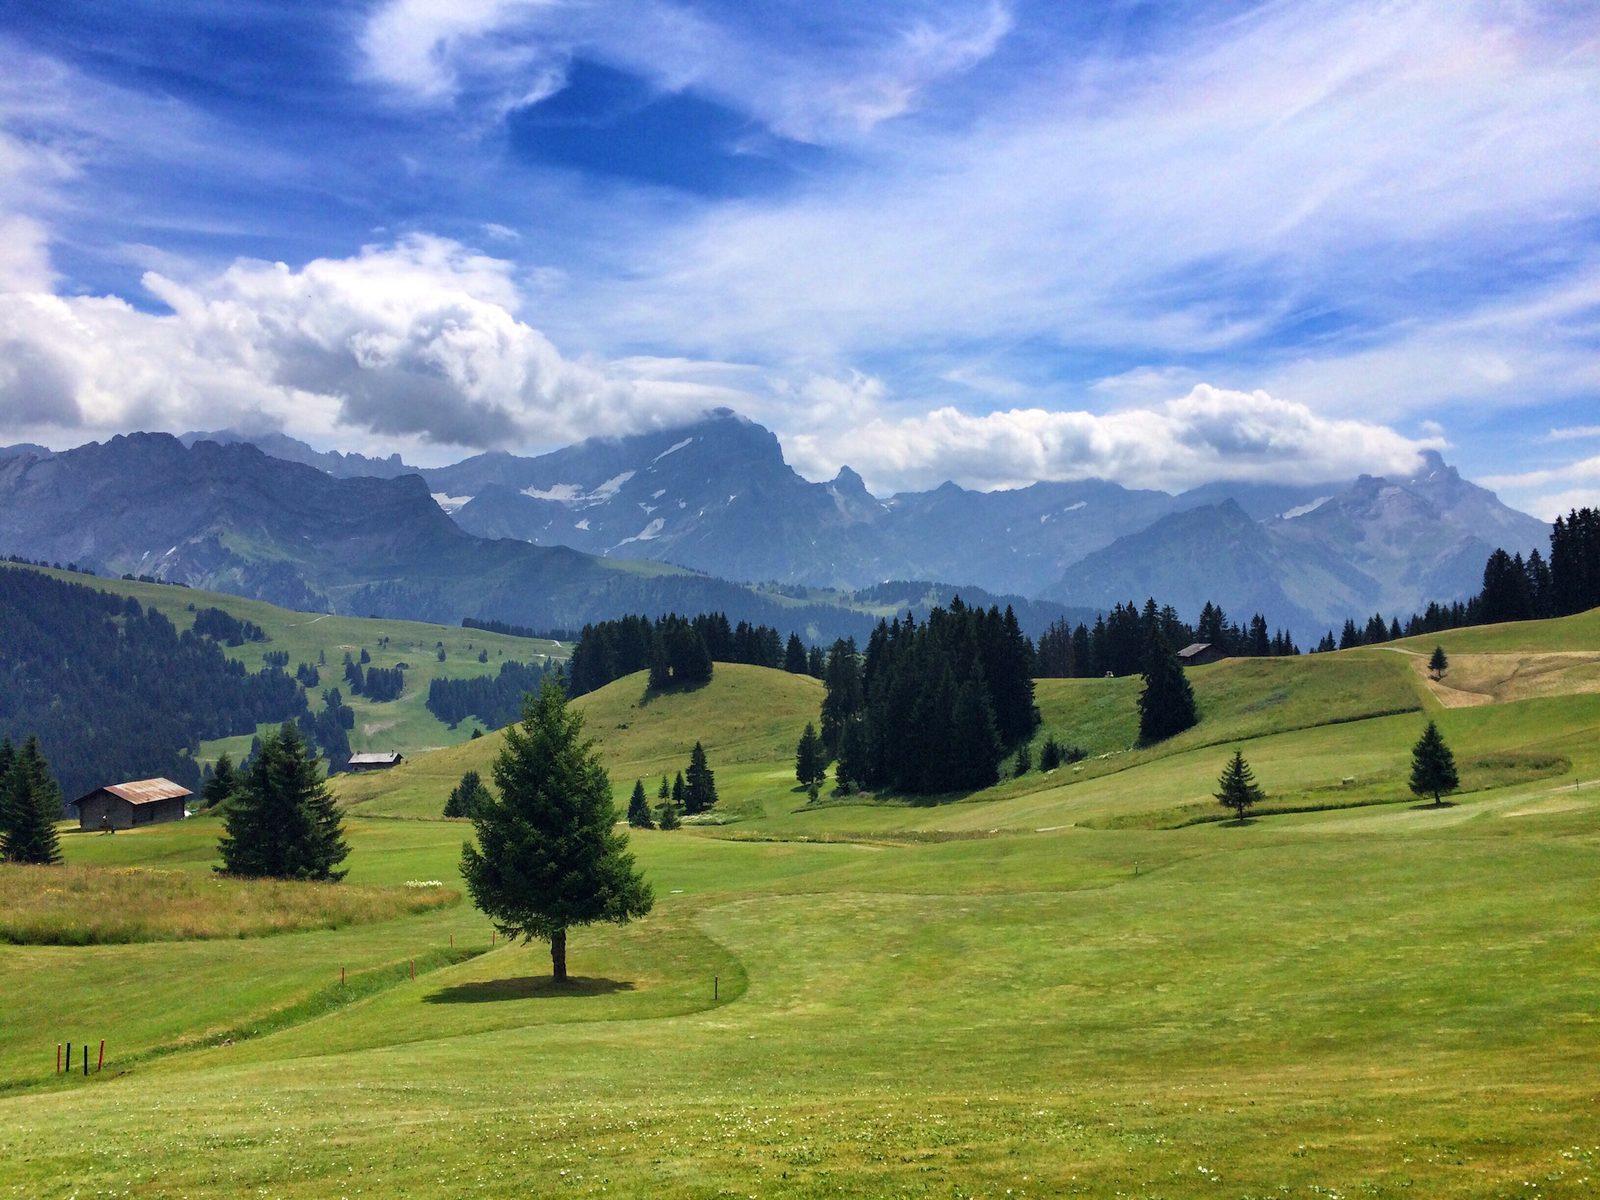 Golfing at golf club Gams-Werdenberg, -Bad Ragaz, -Heidiland, -Dormat/Ems or Lenzerheideg, from your luxury holiday home on Resort Walensee Switzerland